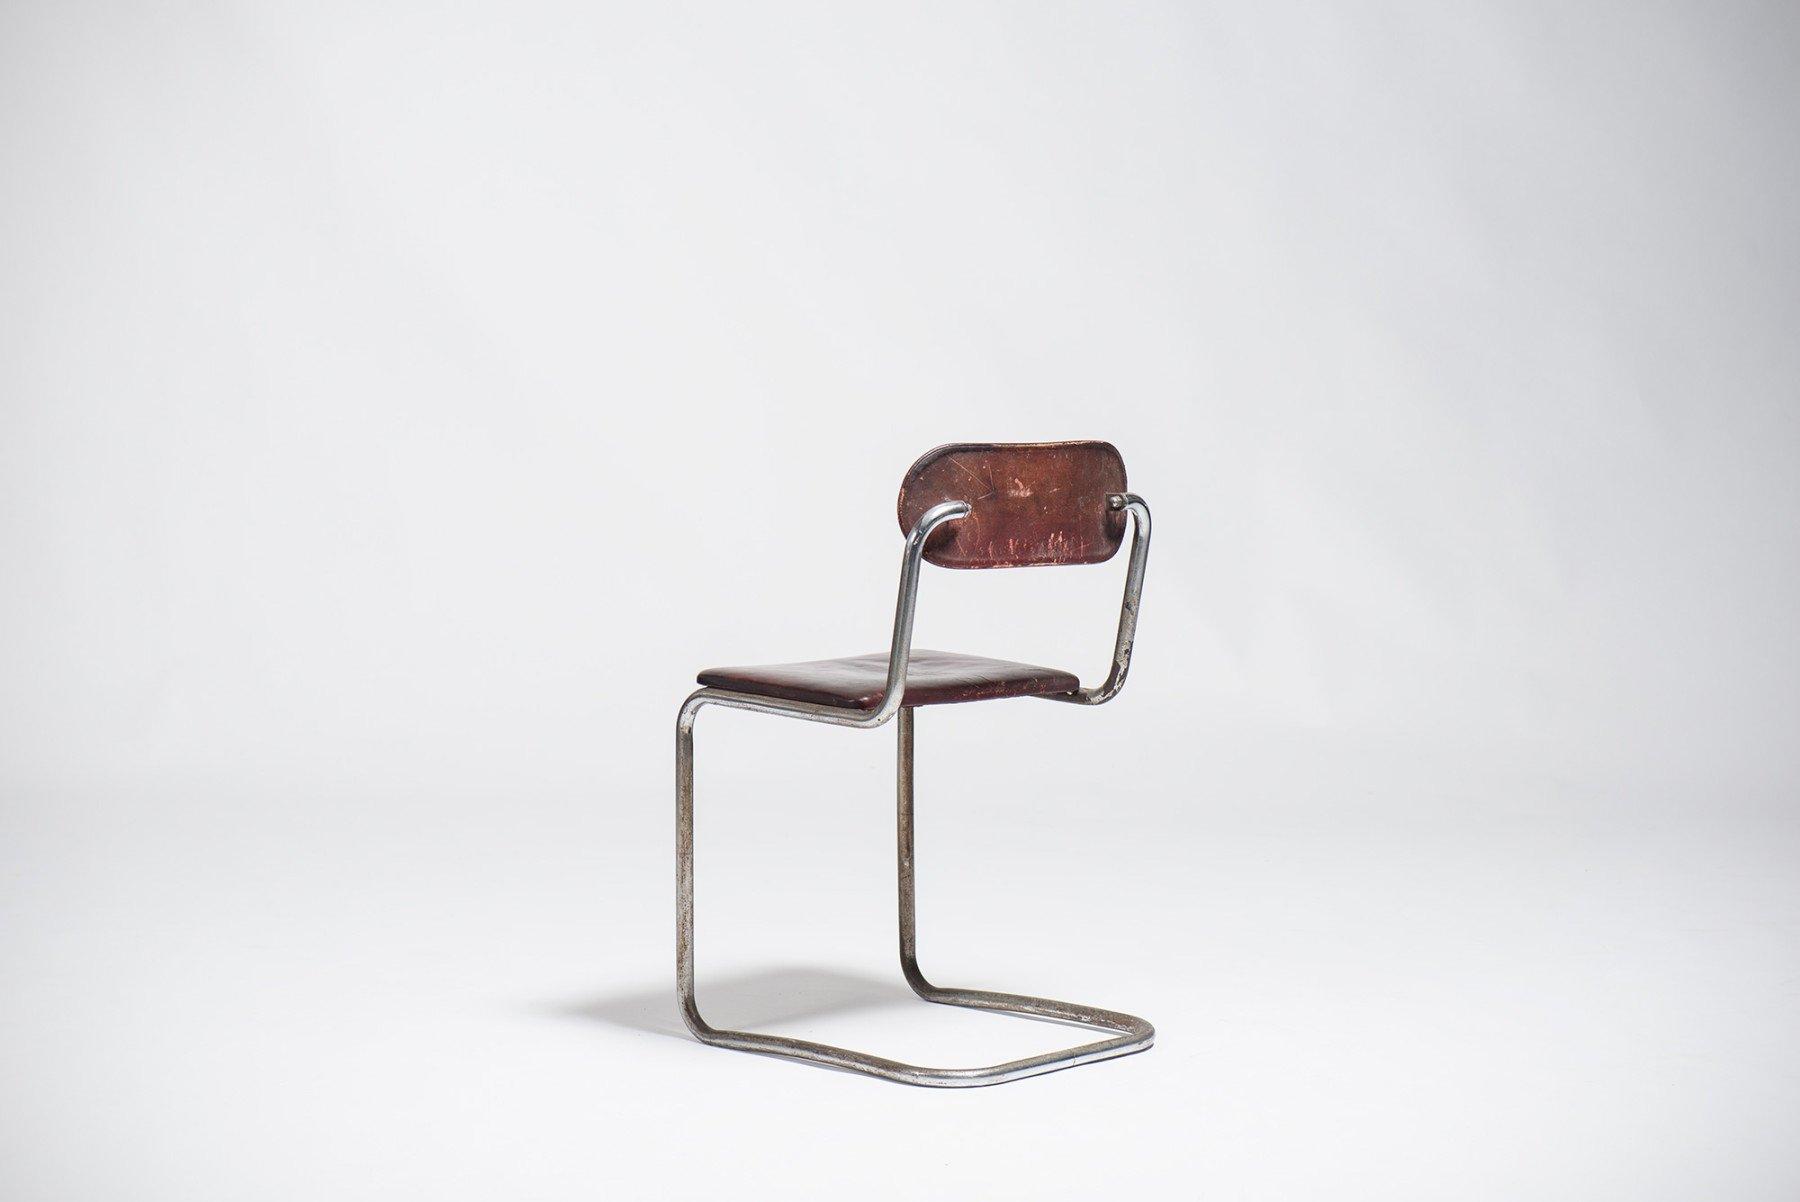 Giuseppe Pagano Pogatschnig |   Chair